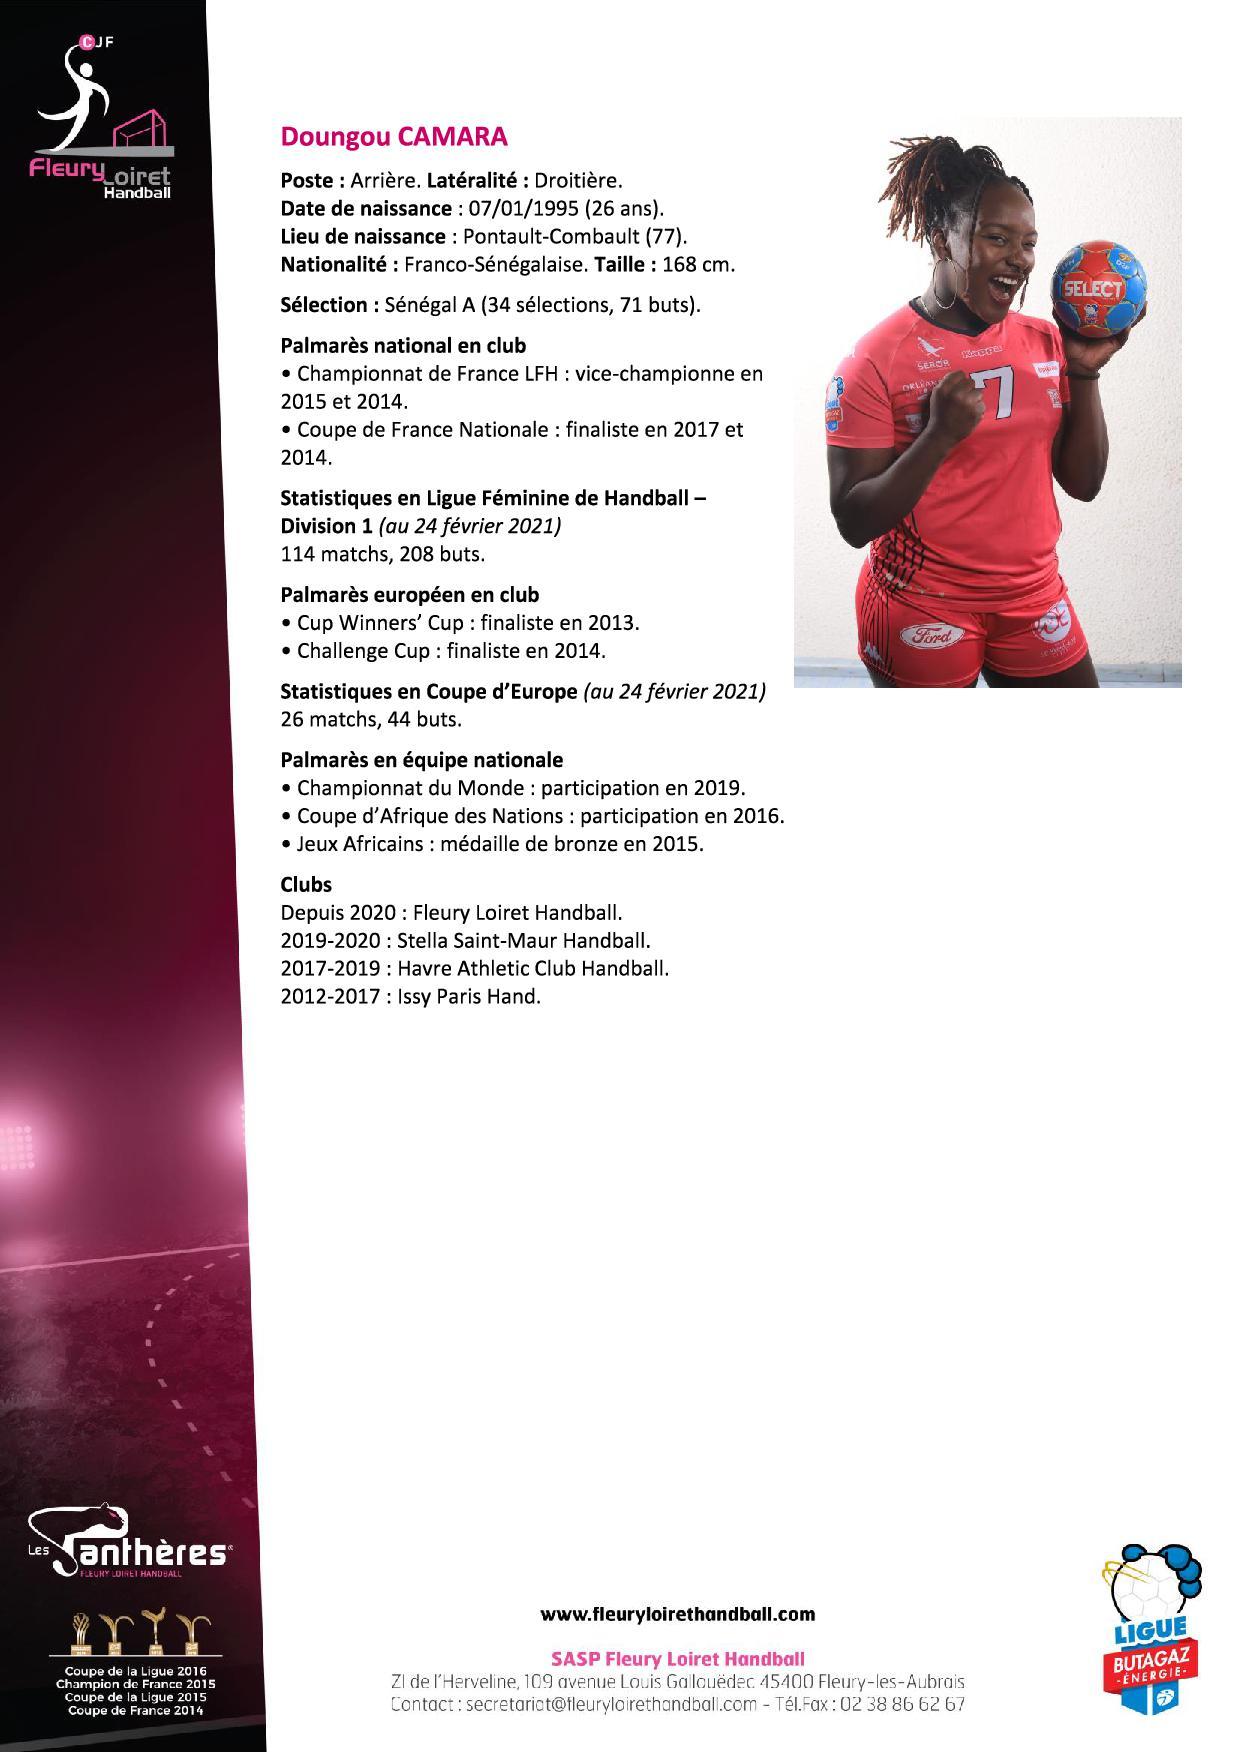 Communiqué Fleury Loiret Handball - Mercredi 24 février 20212.jpg